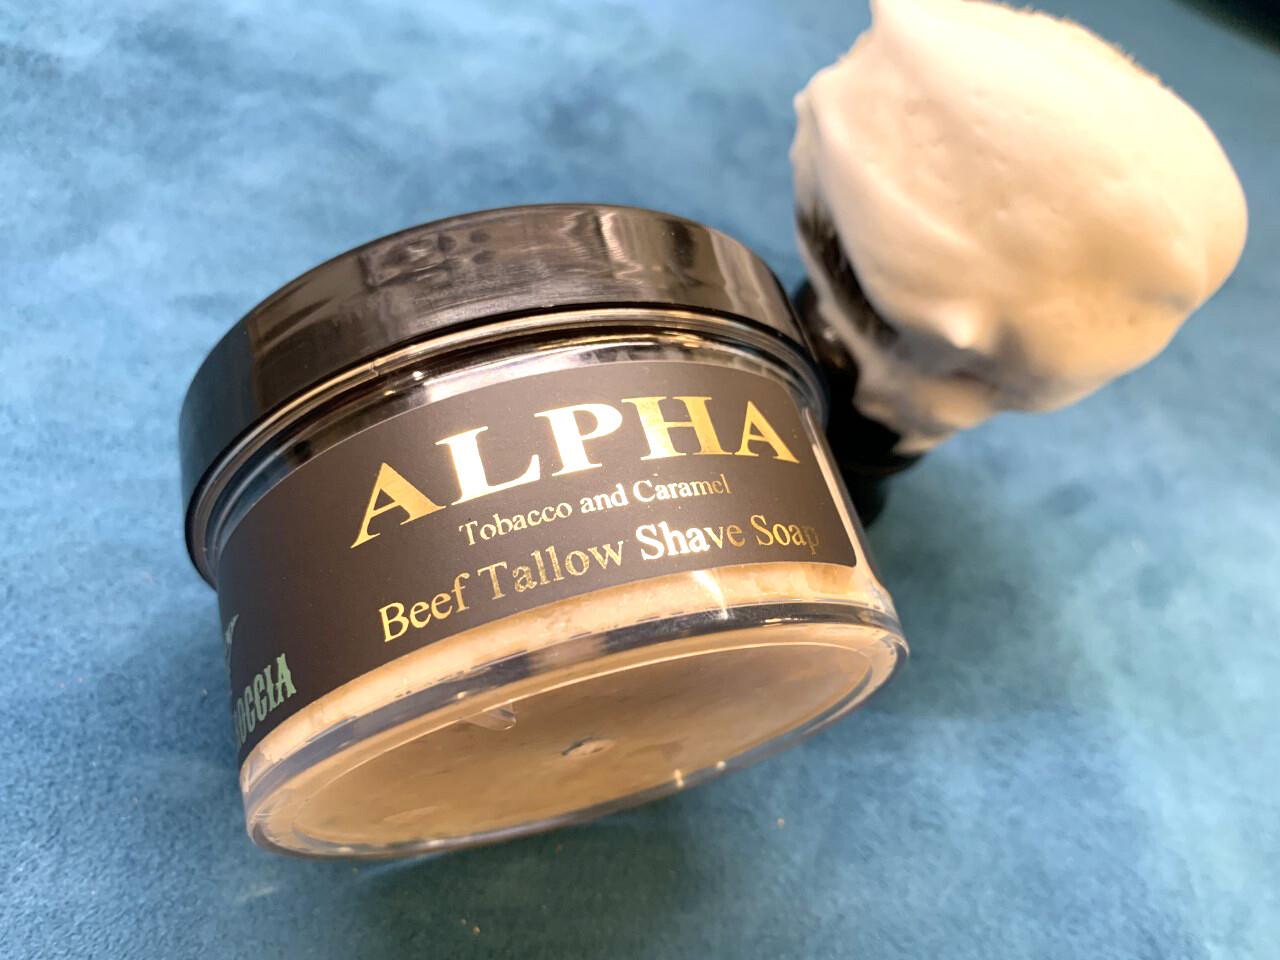 ILR ALPHA Shave Soap 5 oz. (Fresh Tobacco and Caramel)